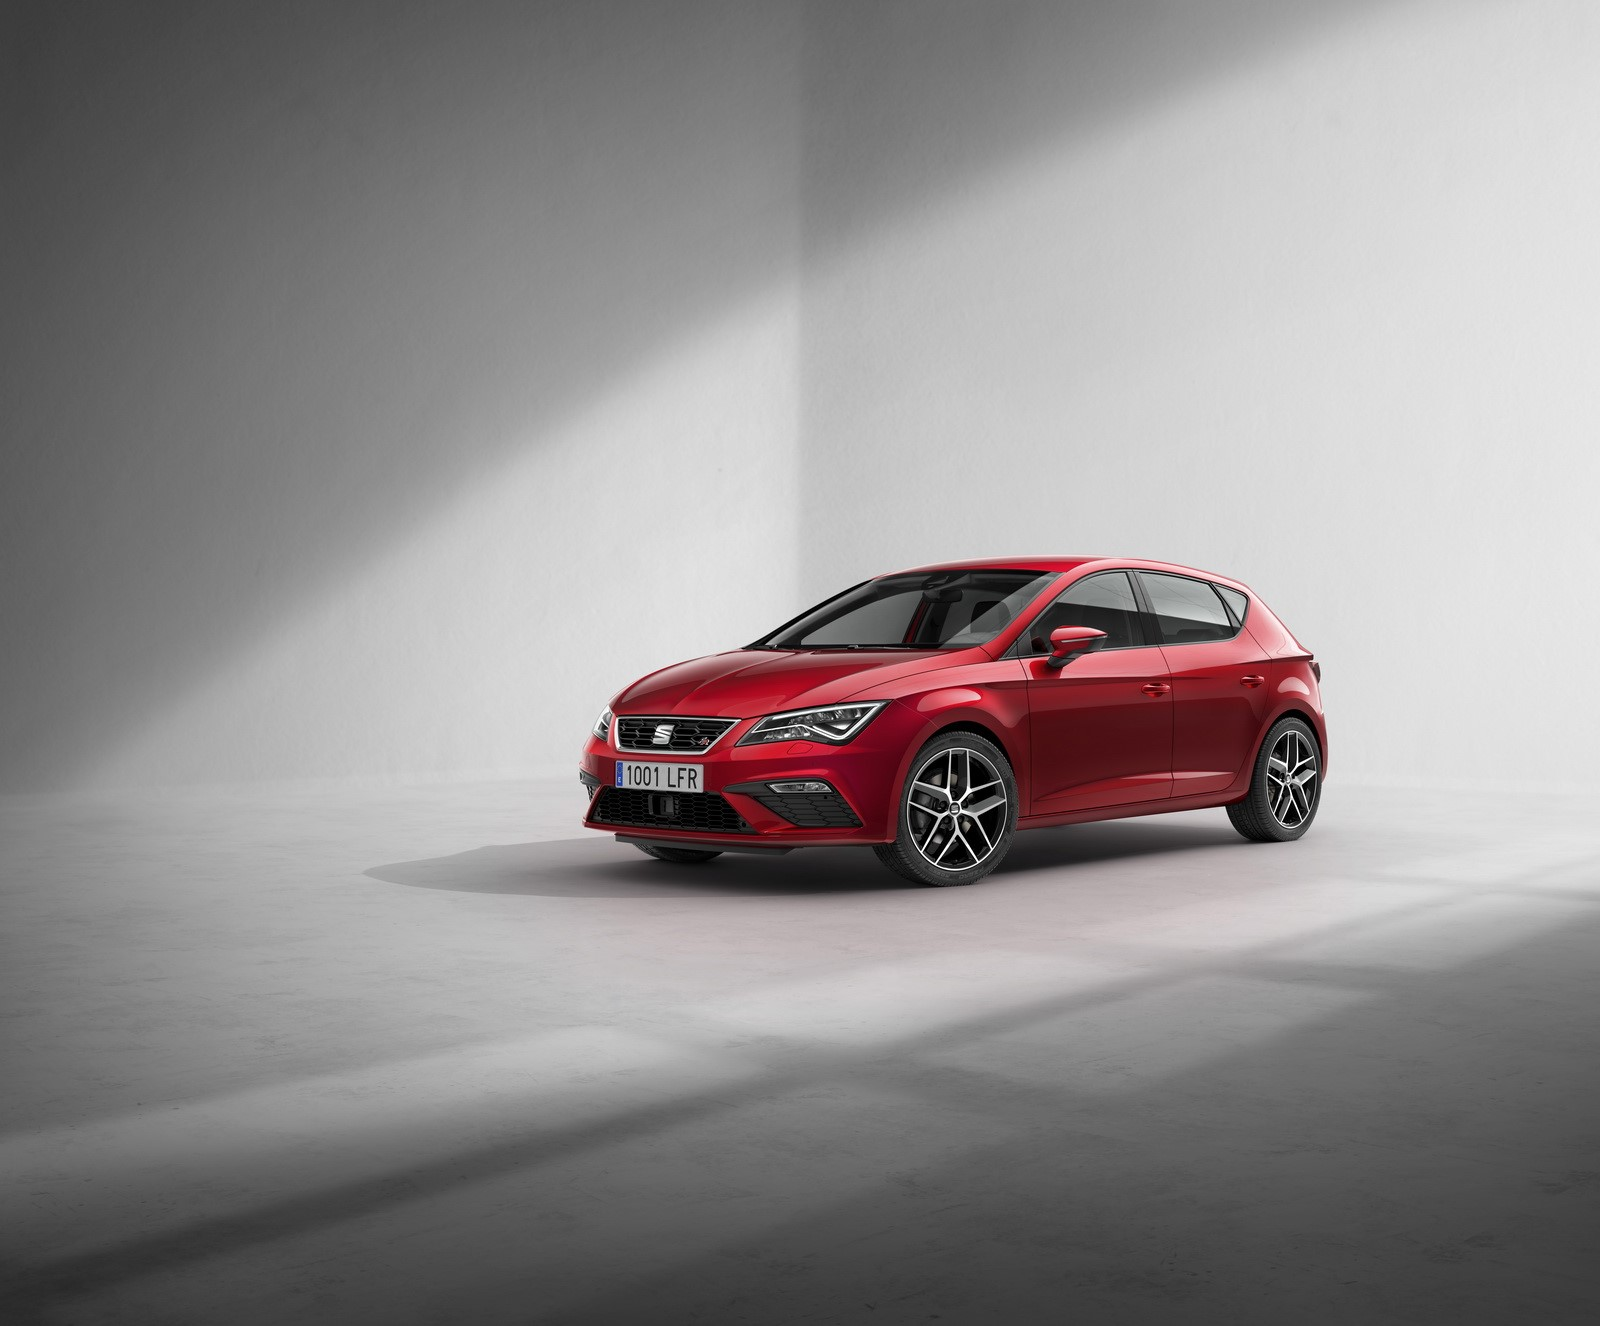 Seat Leon facelift 2017 (4)